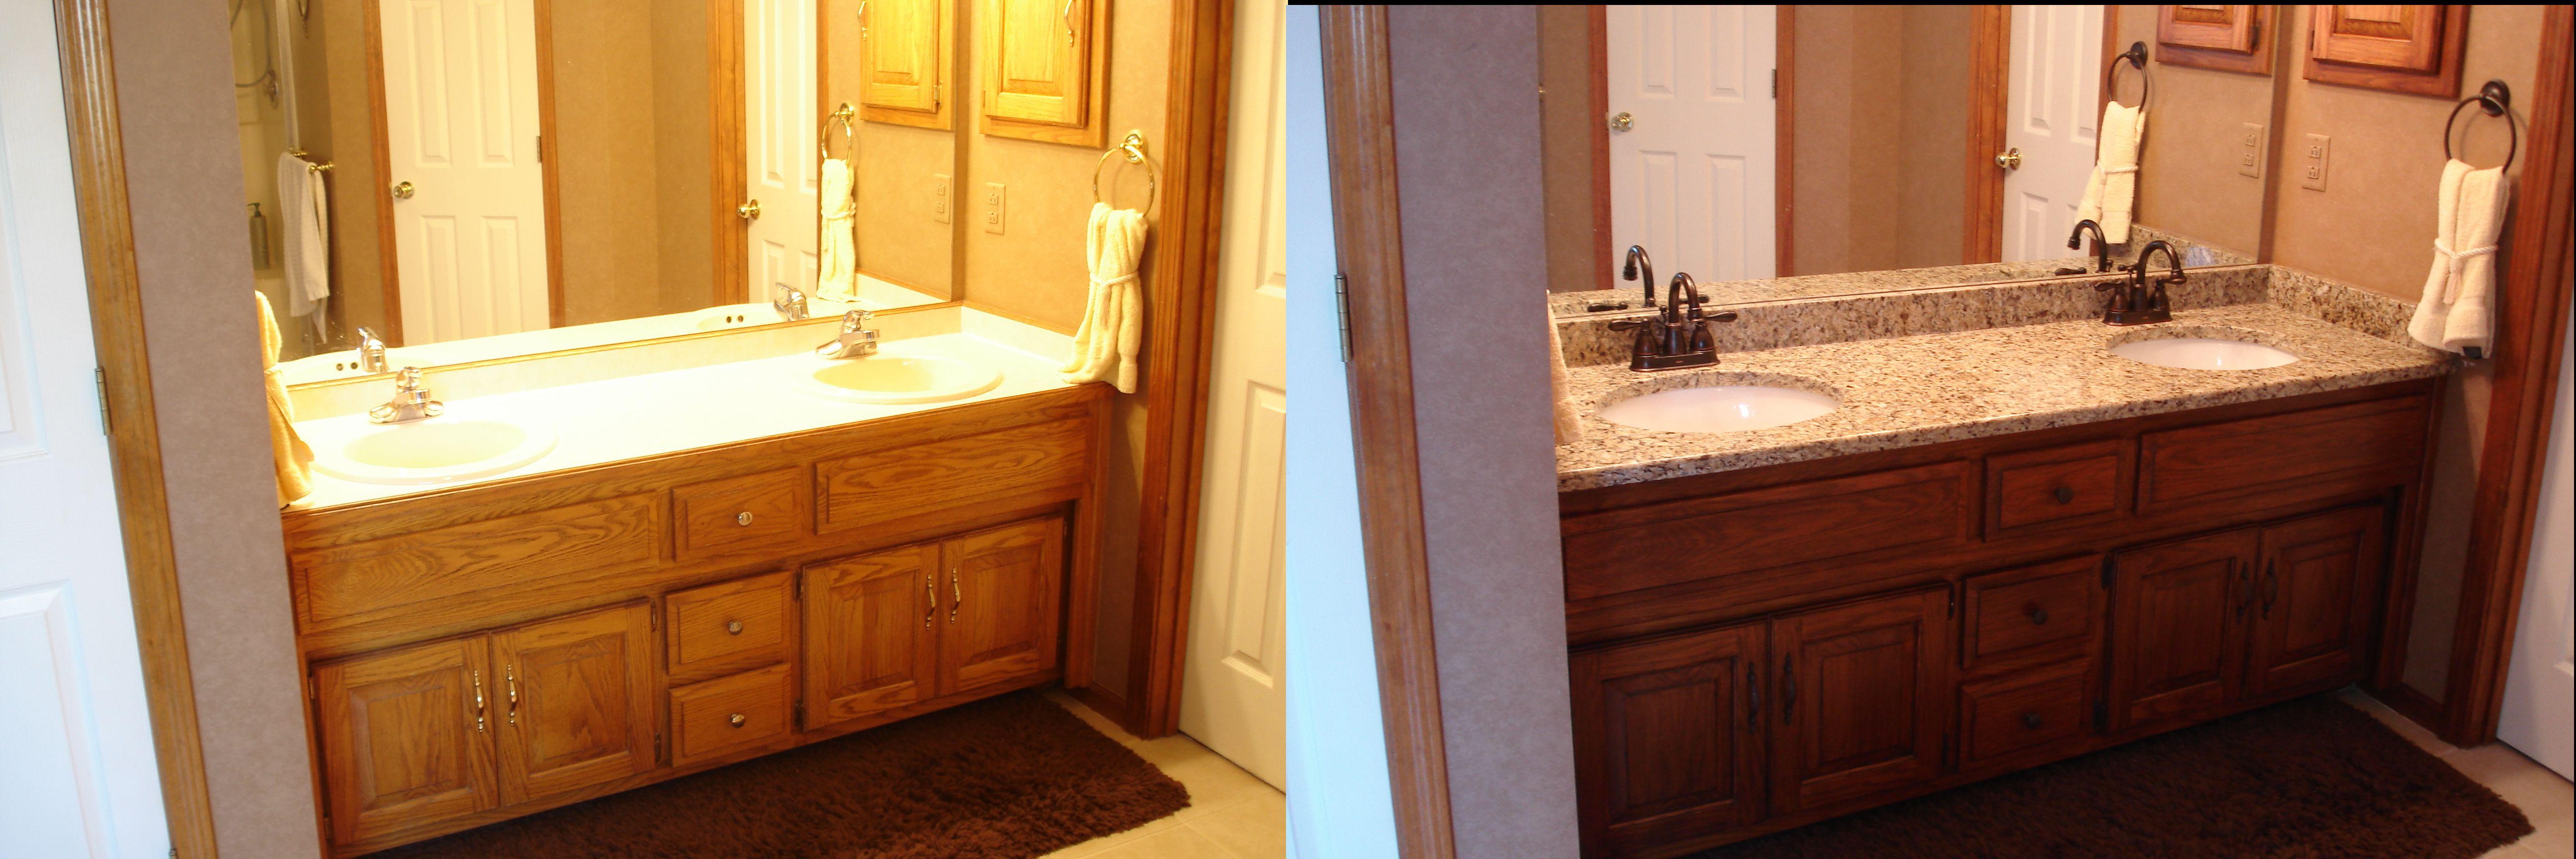 My Golden Oak Master Bath Remodel. Darkened vanity with